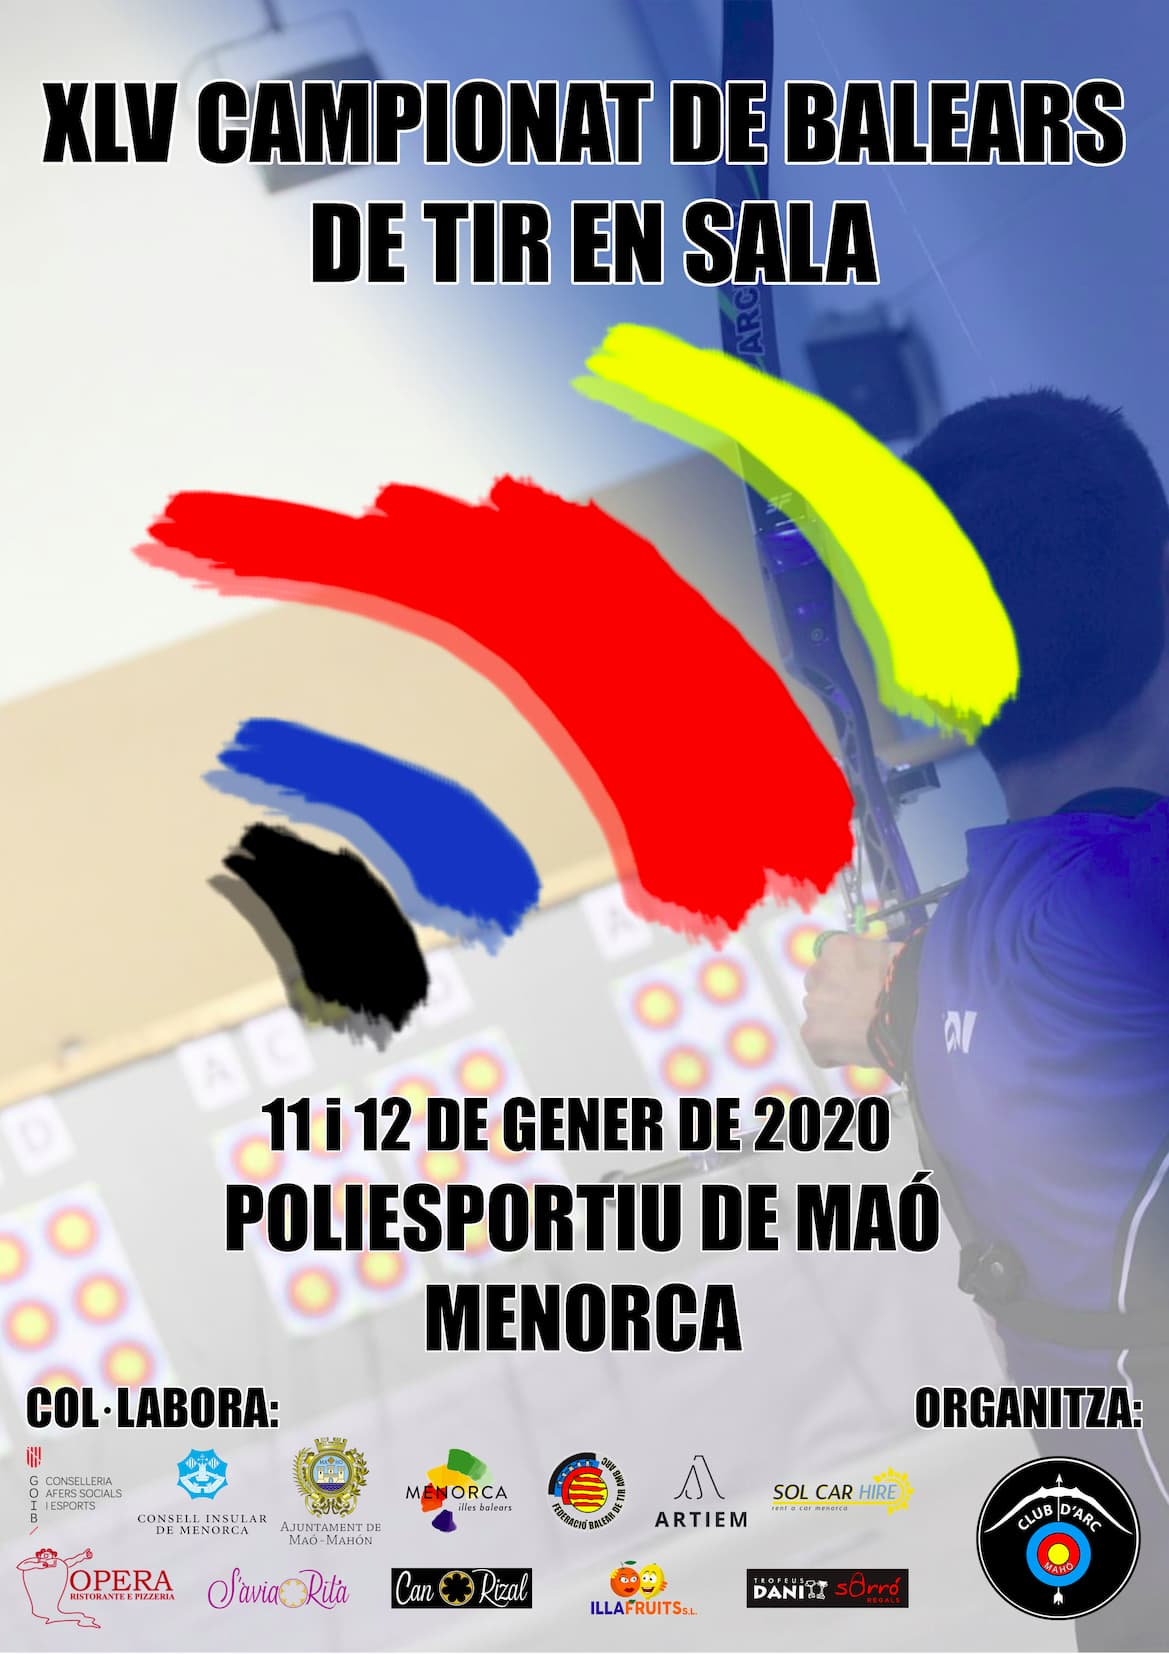 XLV CAMPIONAT DE BALEARS DE TIR EN SALA 2019-2020 @ Poliesportiu Municipal de Maó | Illes Balears | España